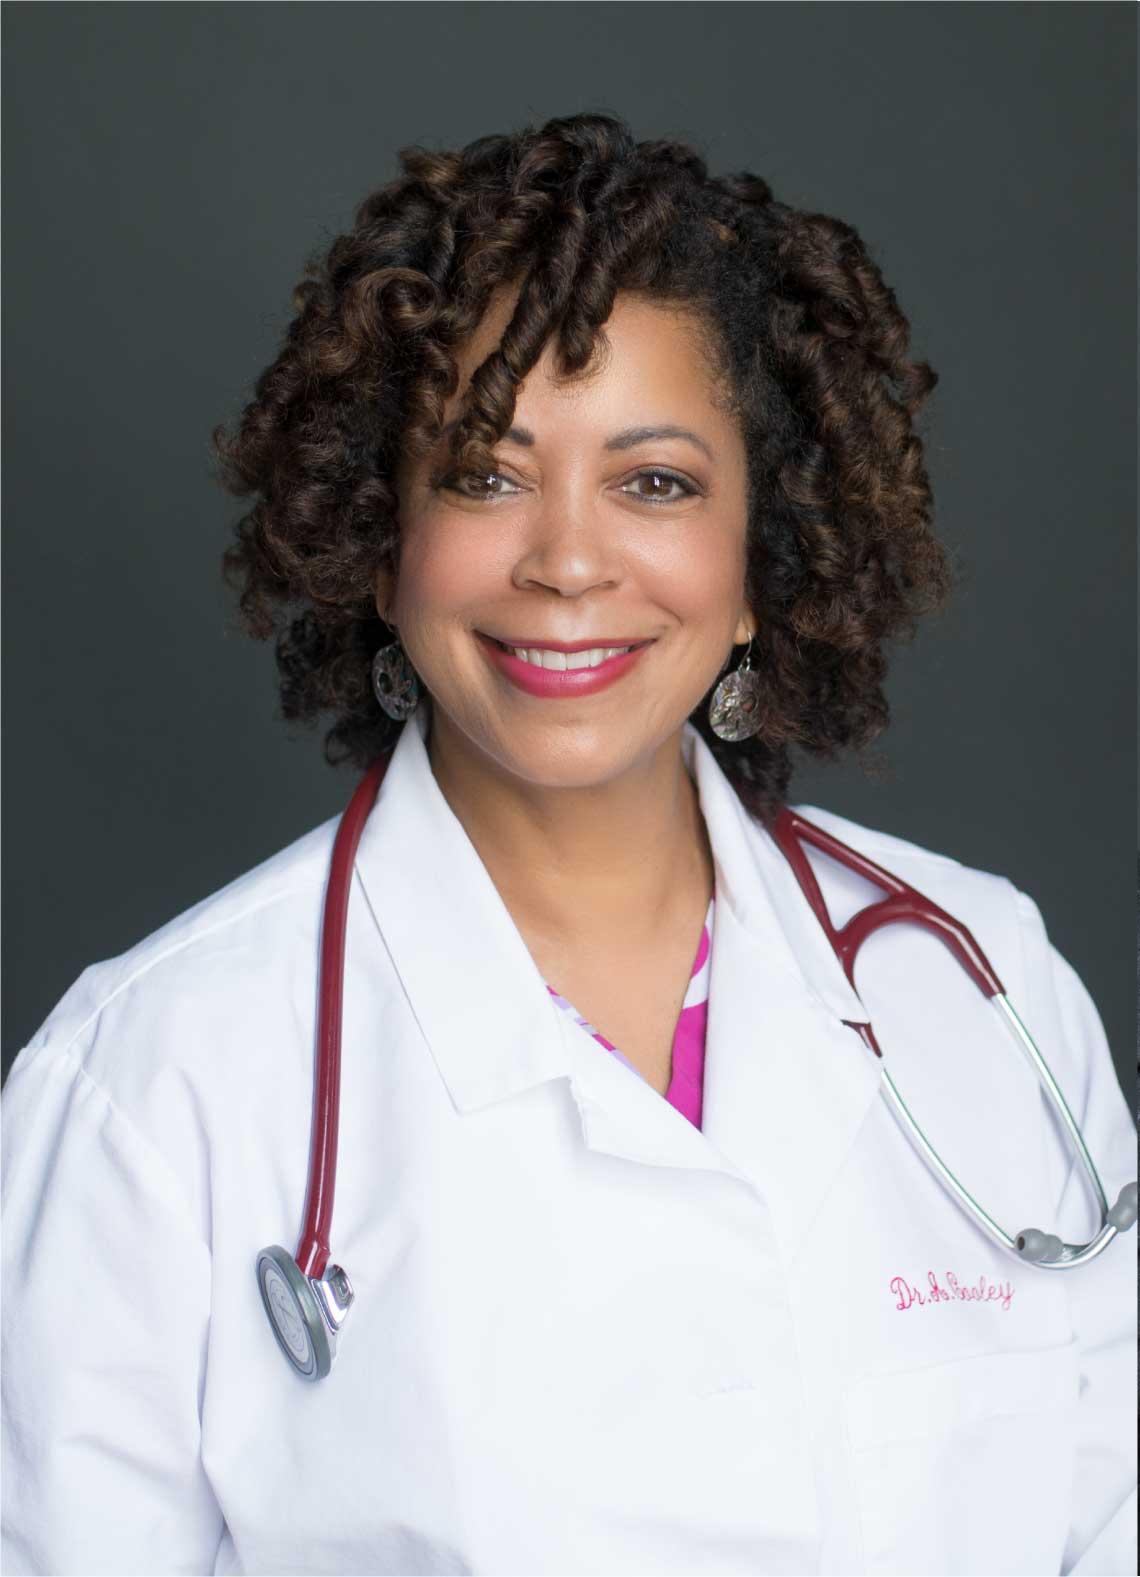 Dr. AJ Cooley, B.Sc., MS, DVM